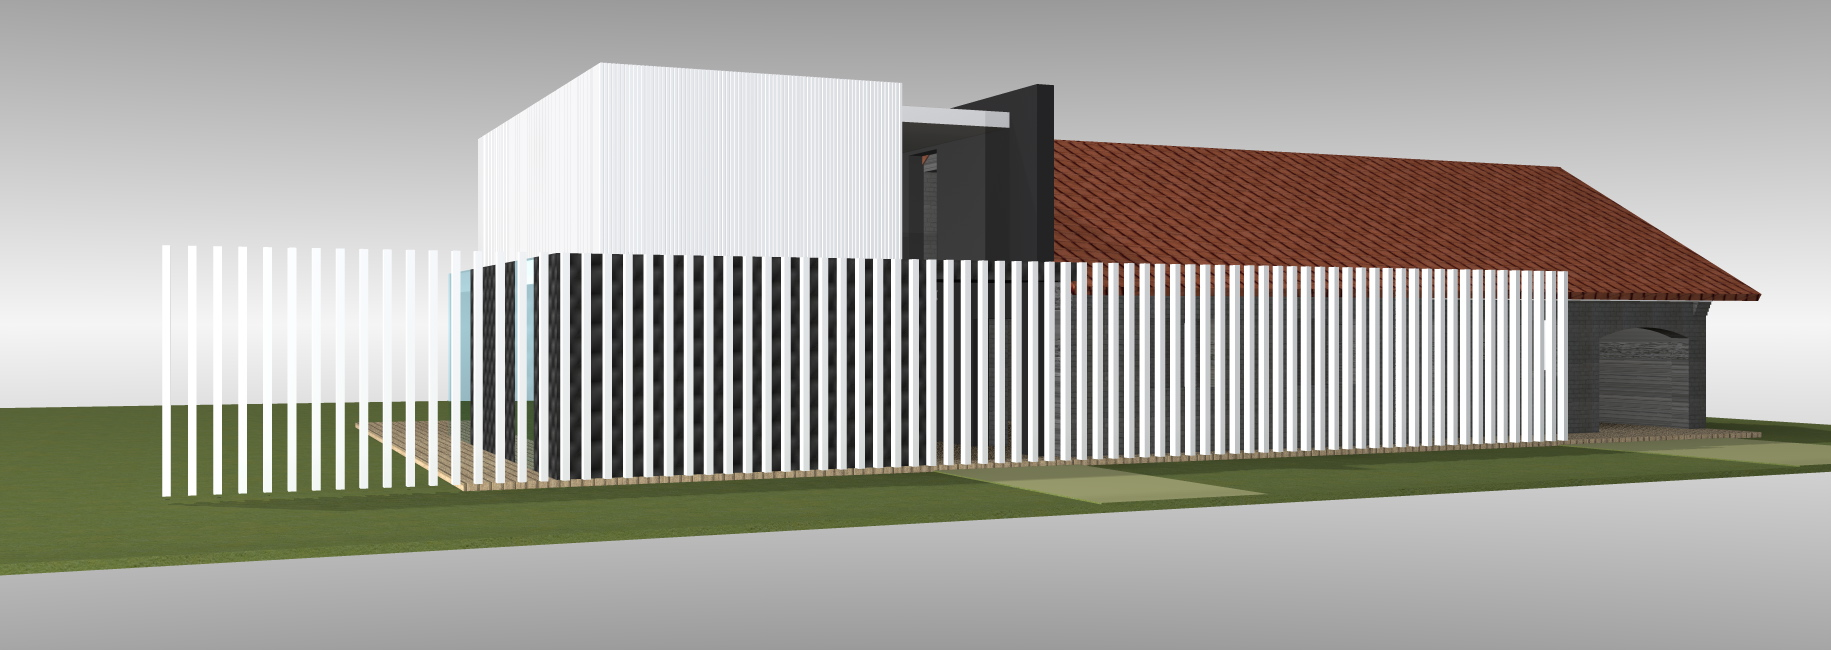 histoire d 39 une esquisse guillaume da silva architecture int rieure guillaume da silva. Black Bedroom Furniture Sets. Home Design Ideas